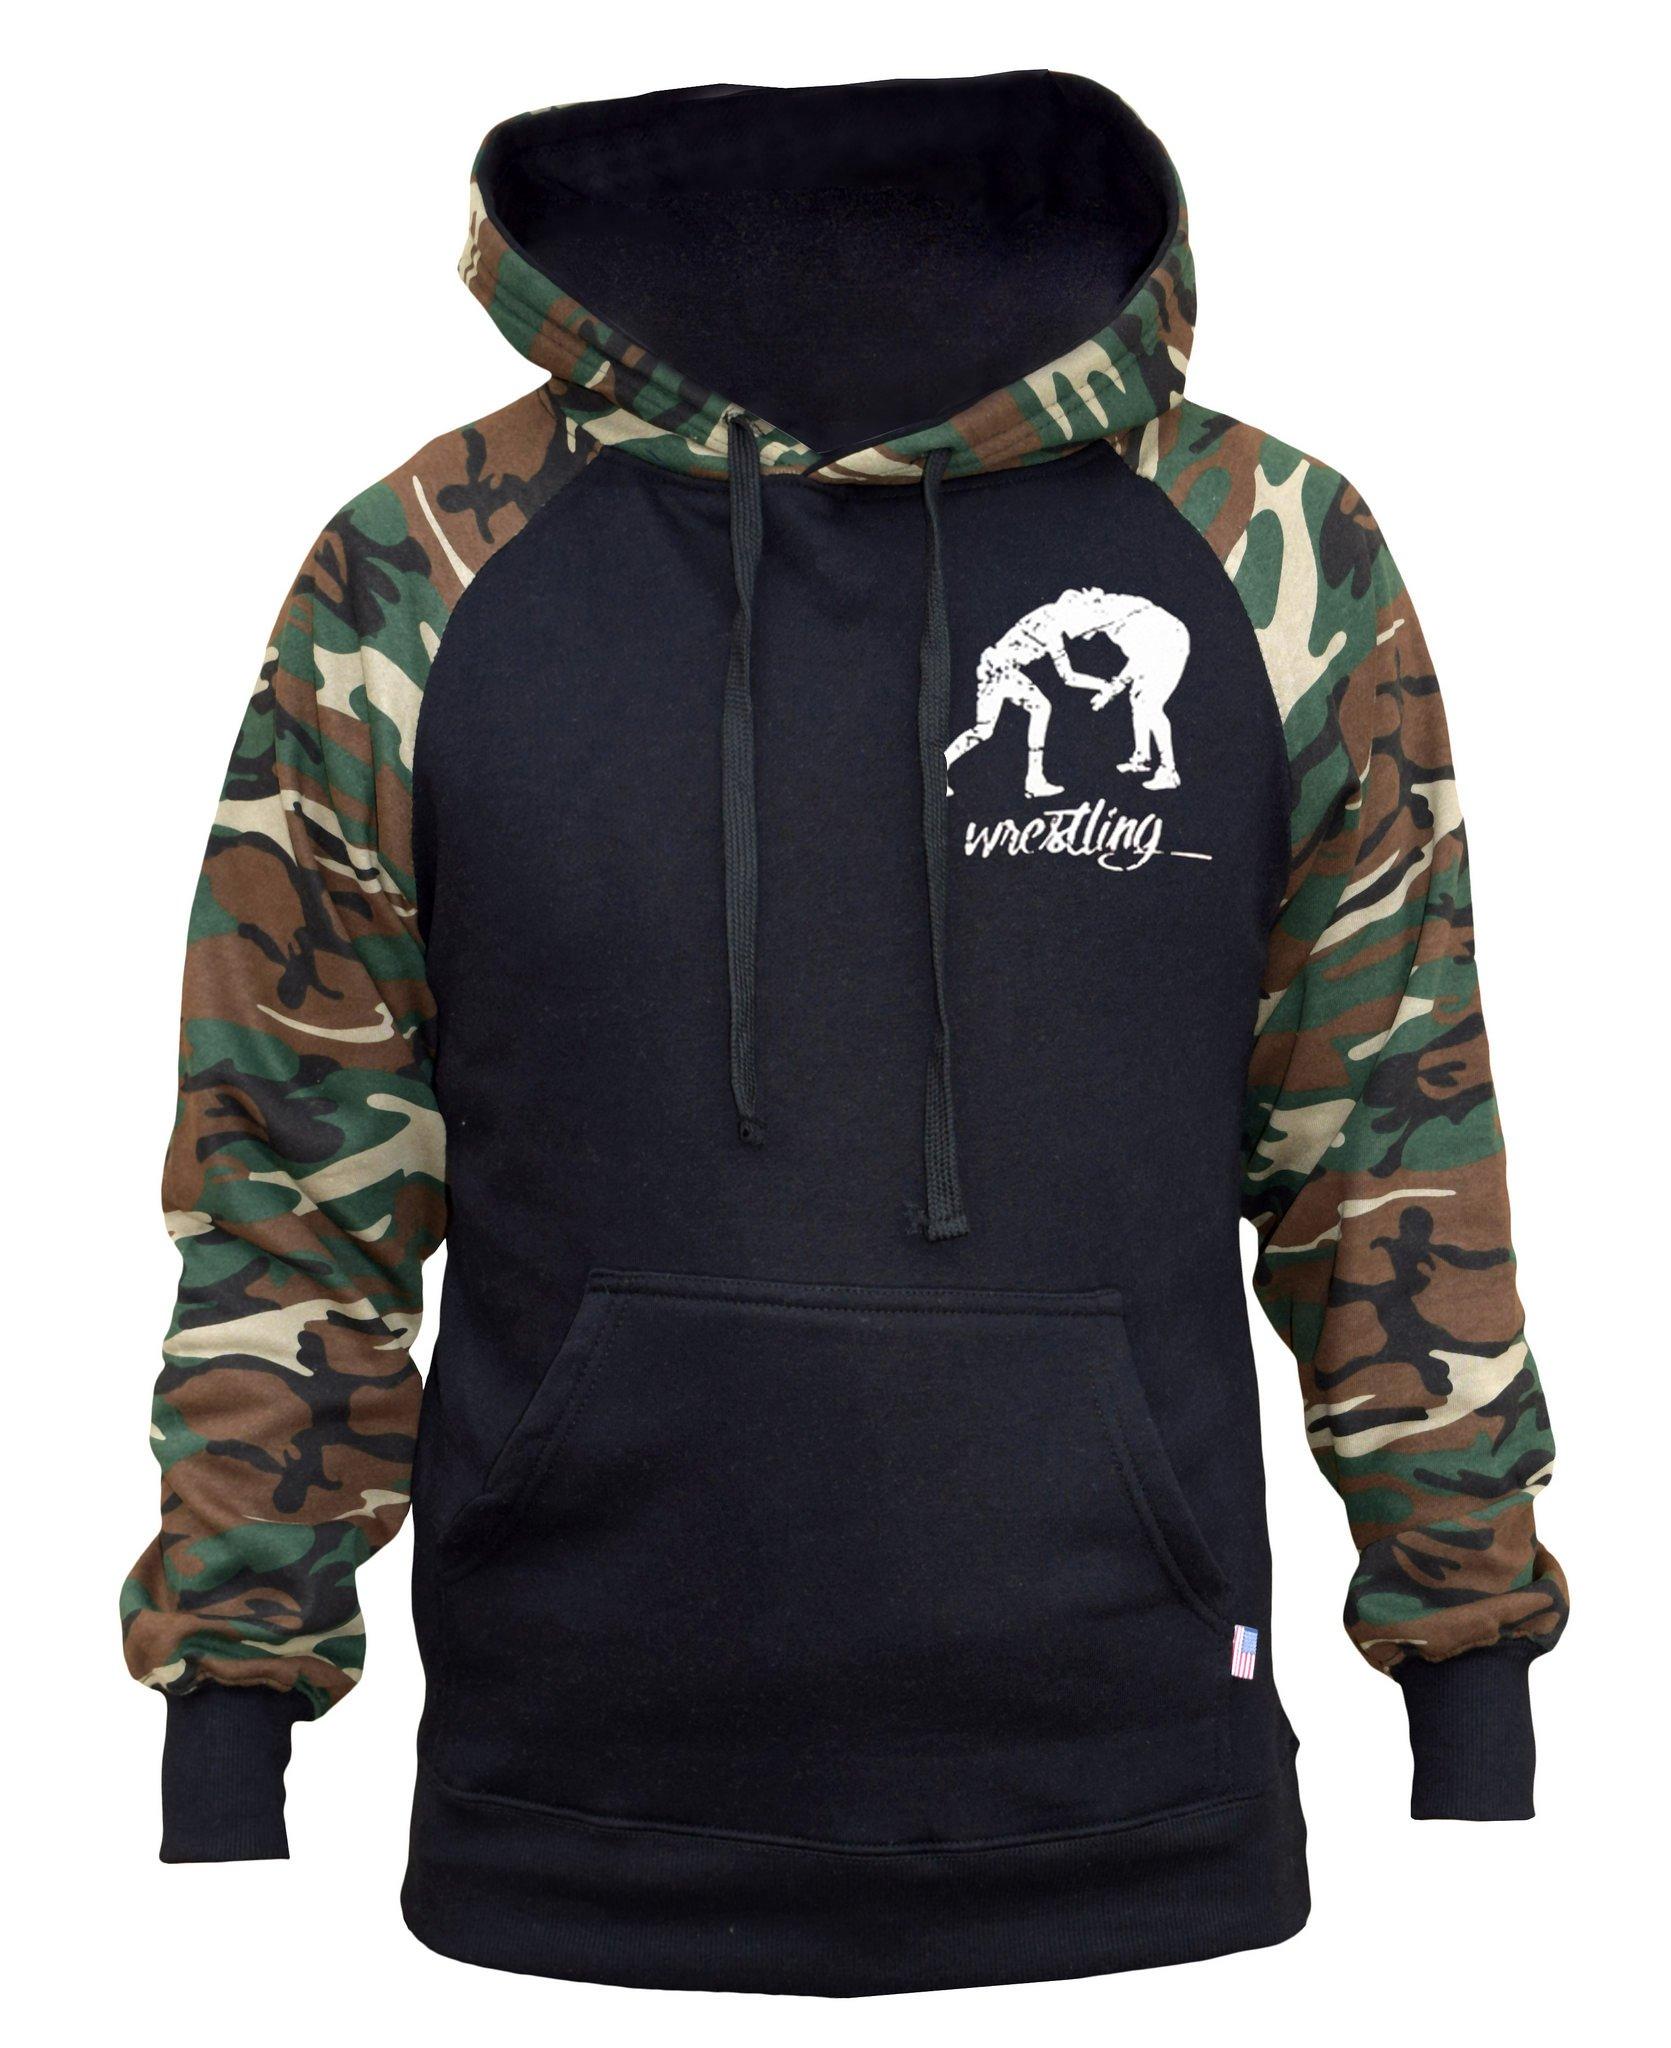 Men's MMA Wrestling Emblem Black/Camo Raglan Baseball Hoodie Medium Black